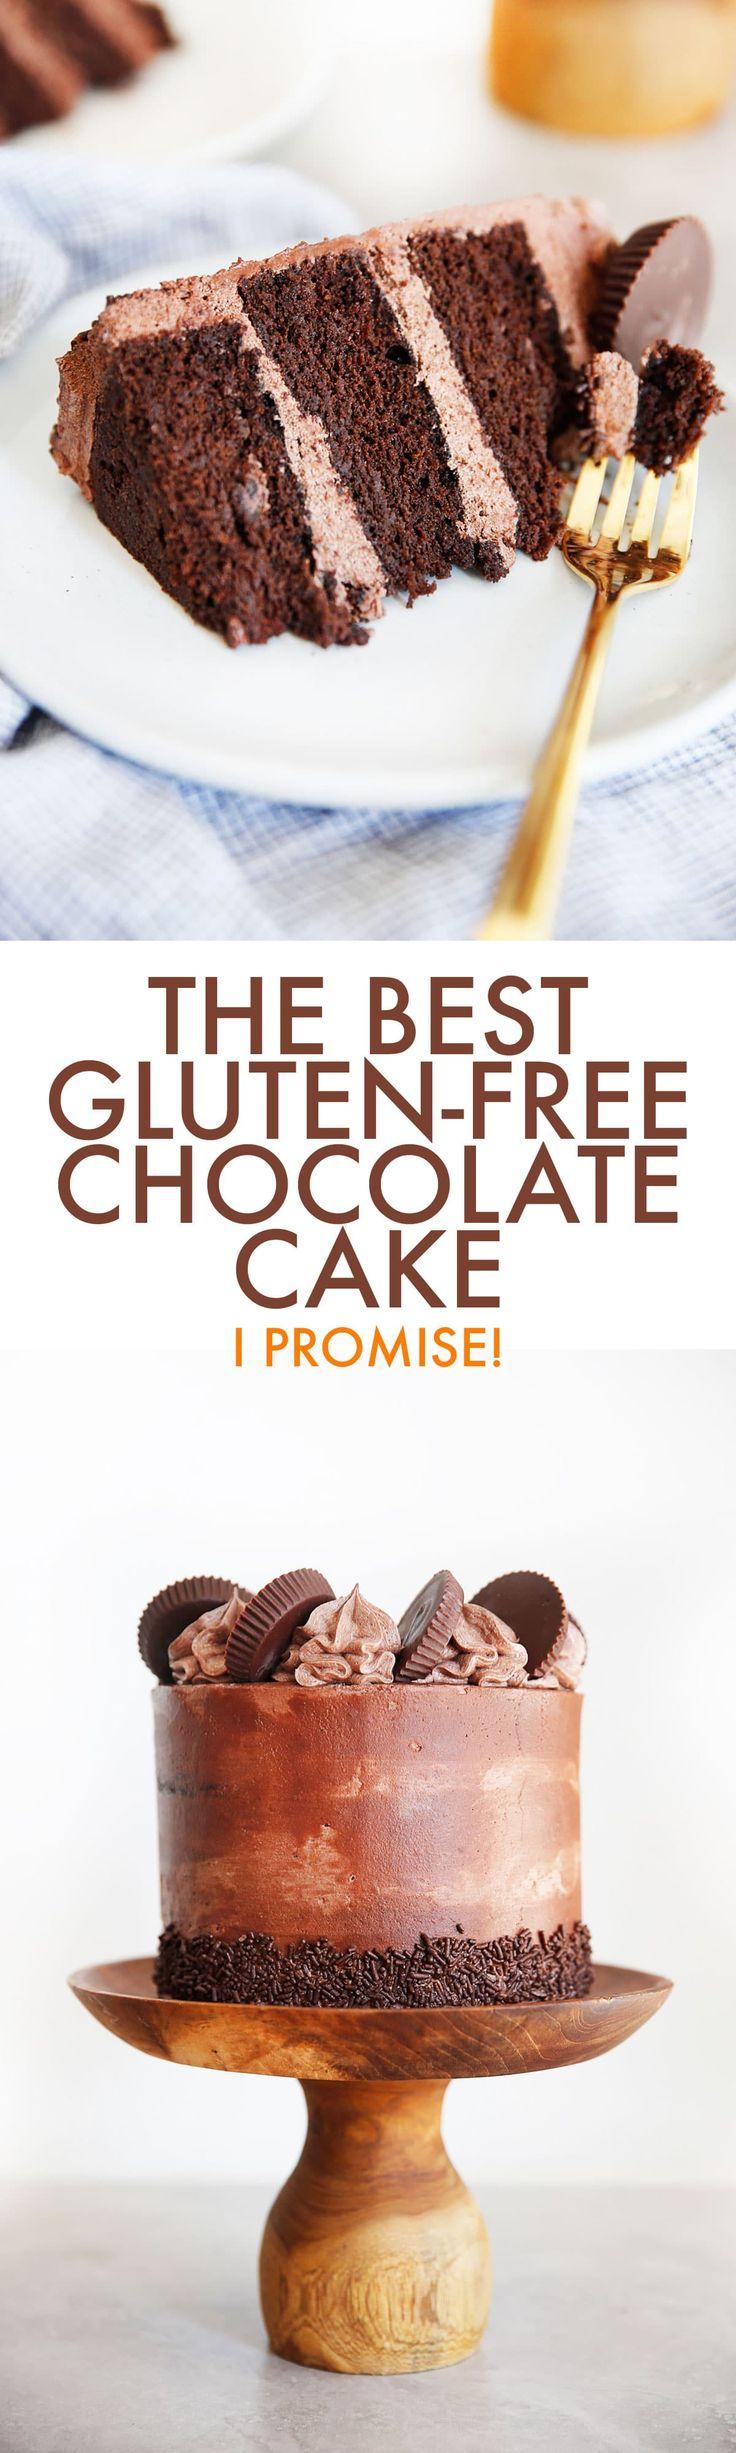 The BEST Gluten-Free Chocolate Cake Recipe – Lexi's Clean Kitchen